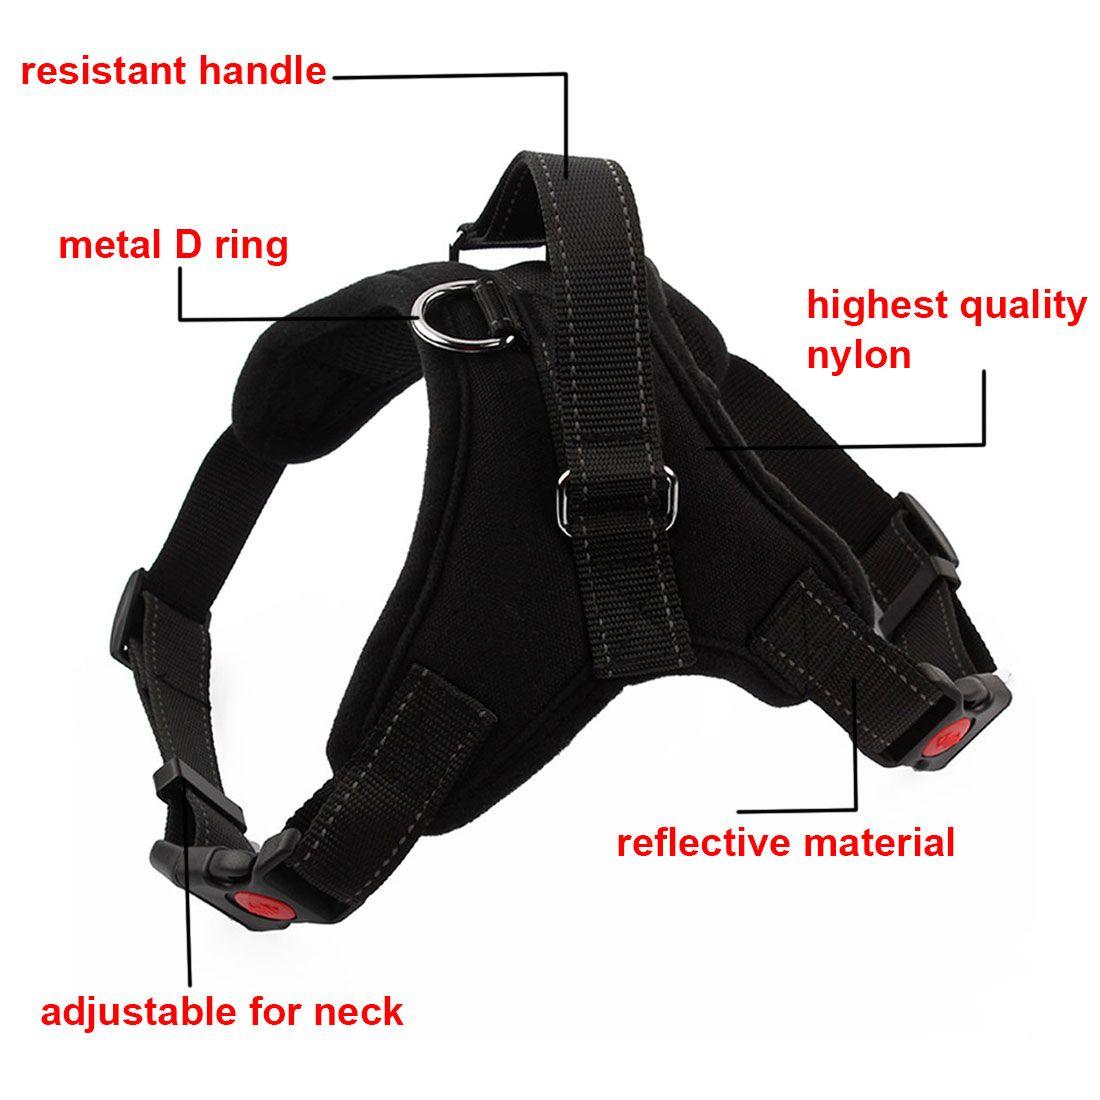 Adjustable dog harness vest padded for large medium small